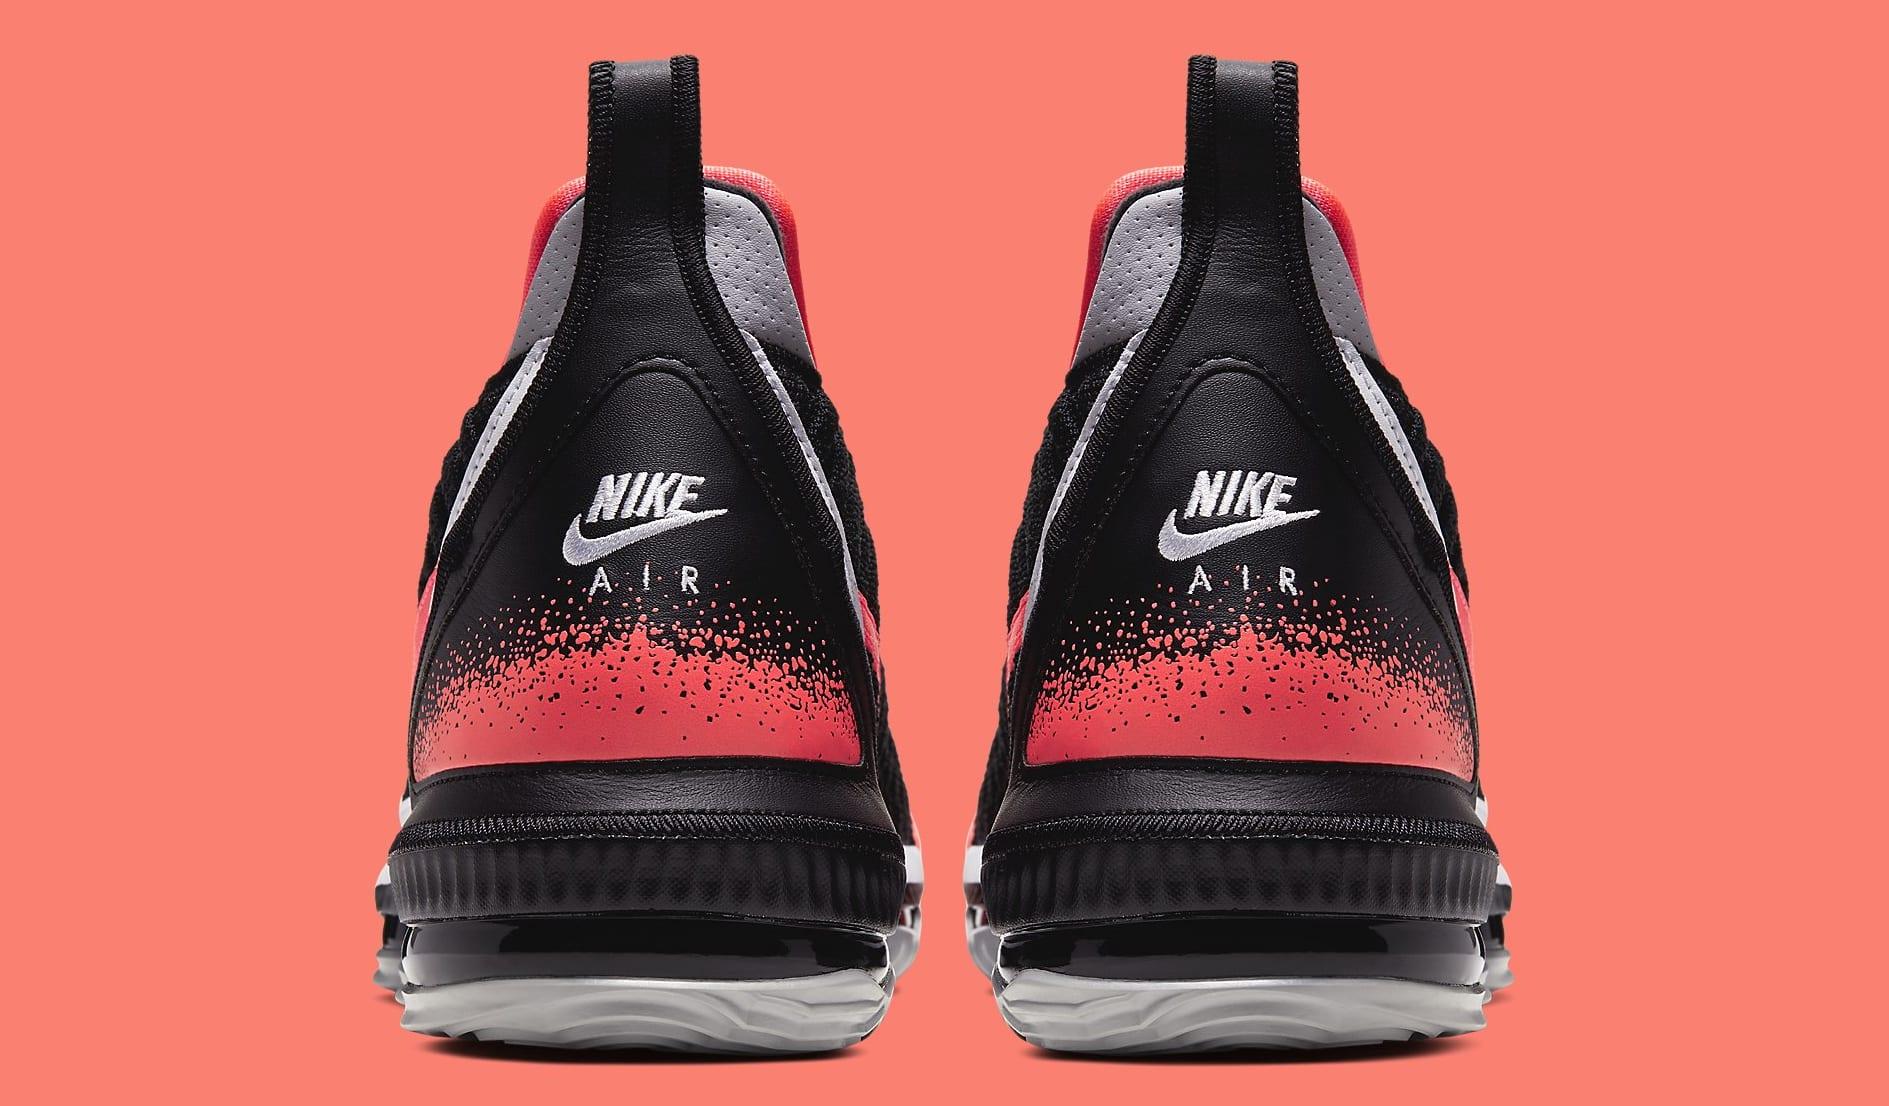 Nike LeBron 16 'Hot Lava' Black CI1521-001 Heel